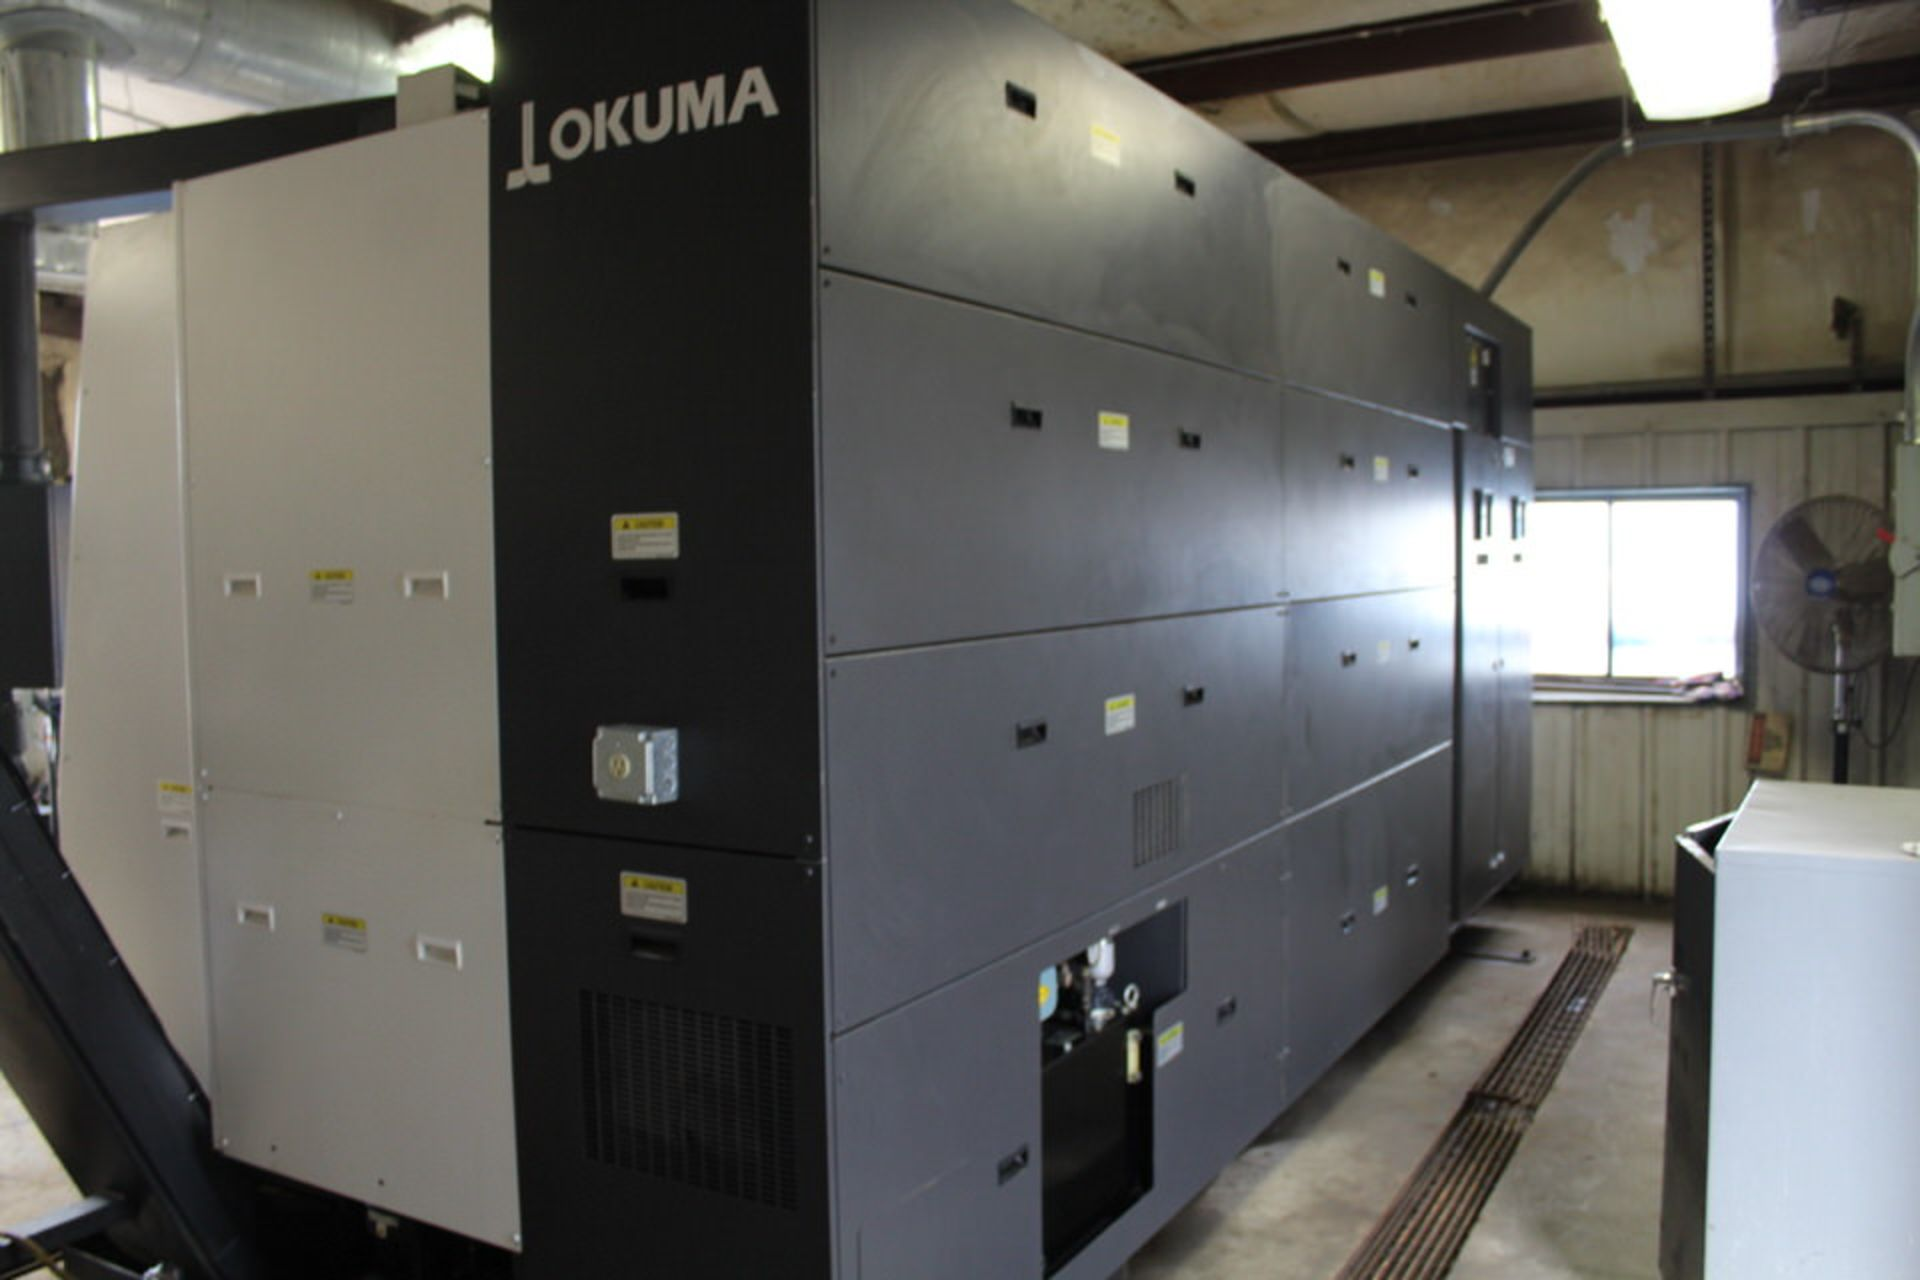 2018 OKUMA LU35II X 1500MM DUAL TURRET CNC LATHE - Image 8 of 12